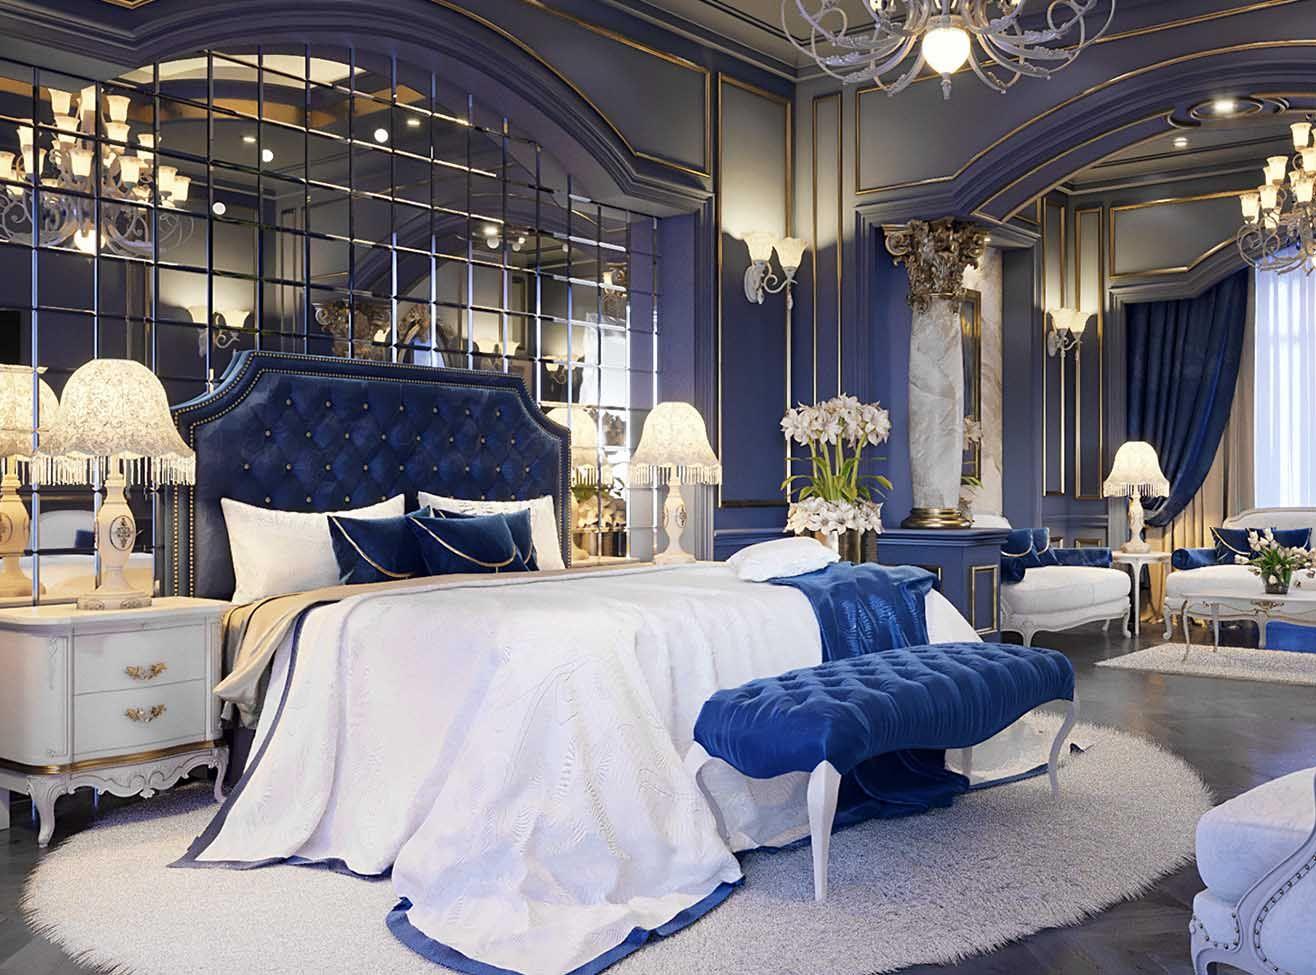 Luxury Royal Blue Bedroom Decor With Art Deco Style Blue Velvet